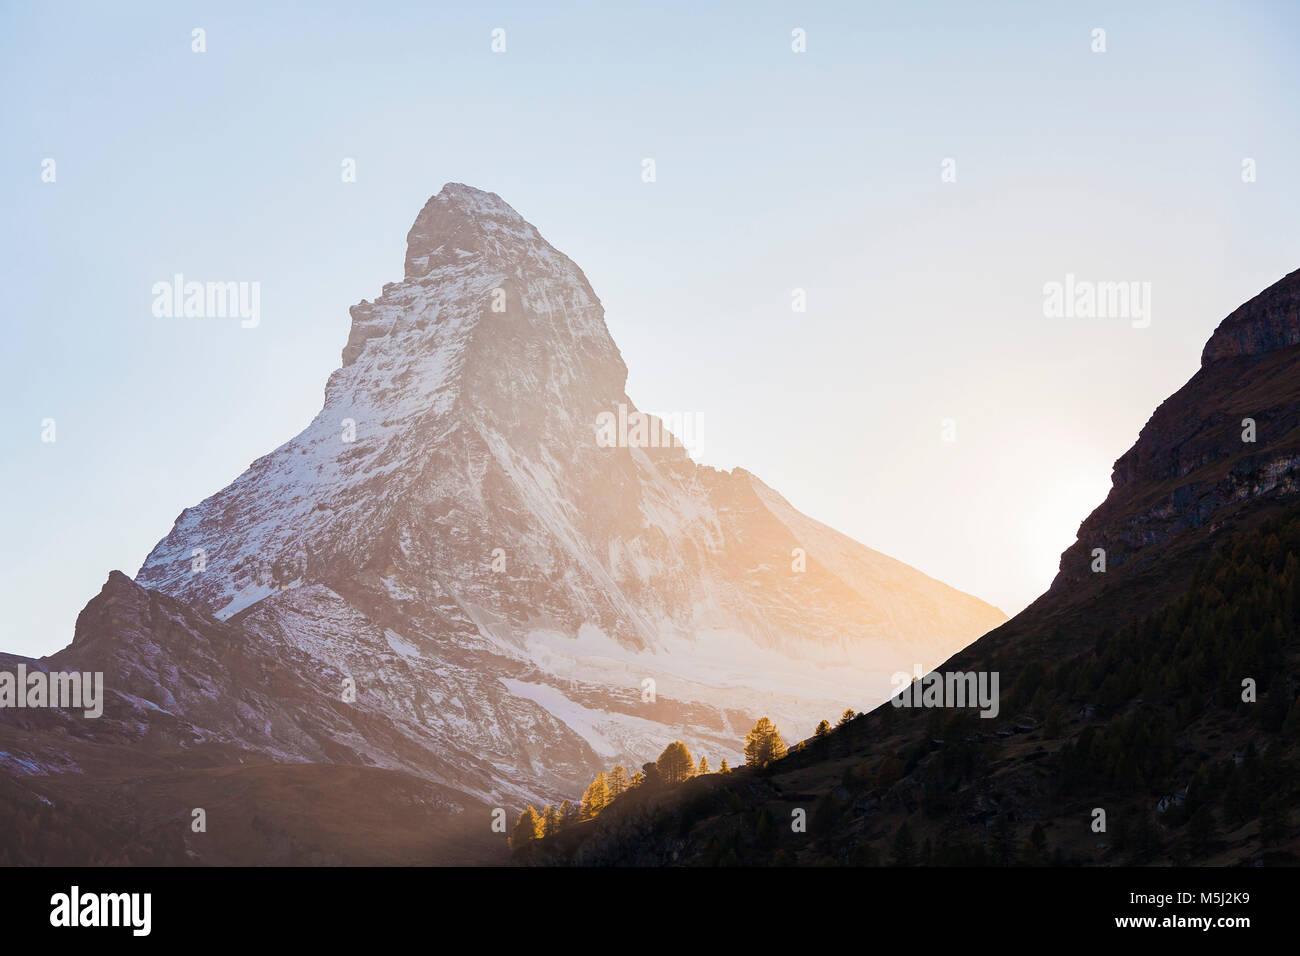 Schweiz, Kanton Wallis, Zermatt, Matterhorn - Stock Image